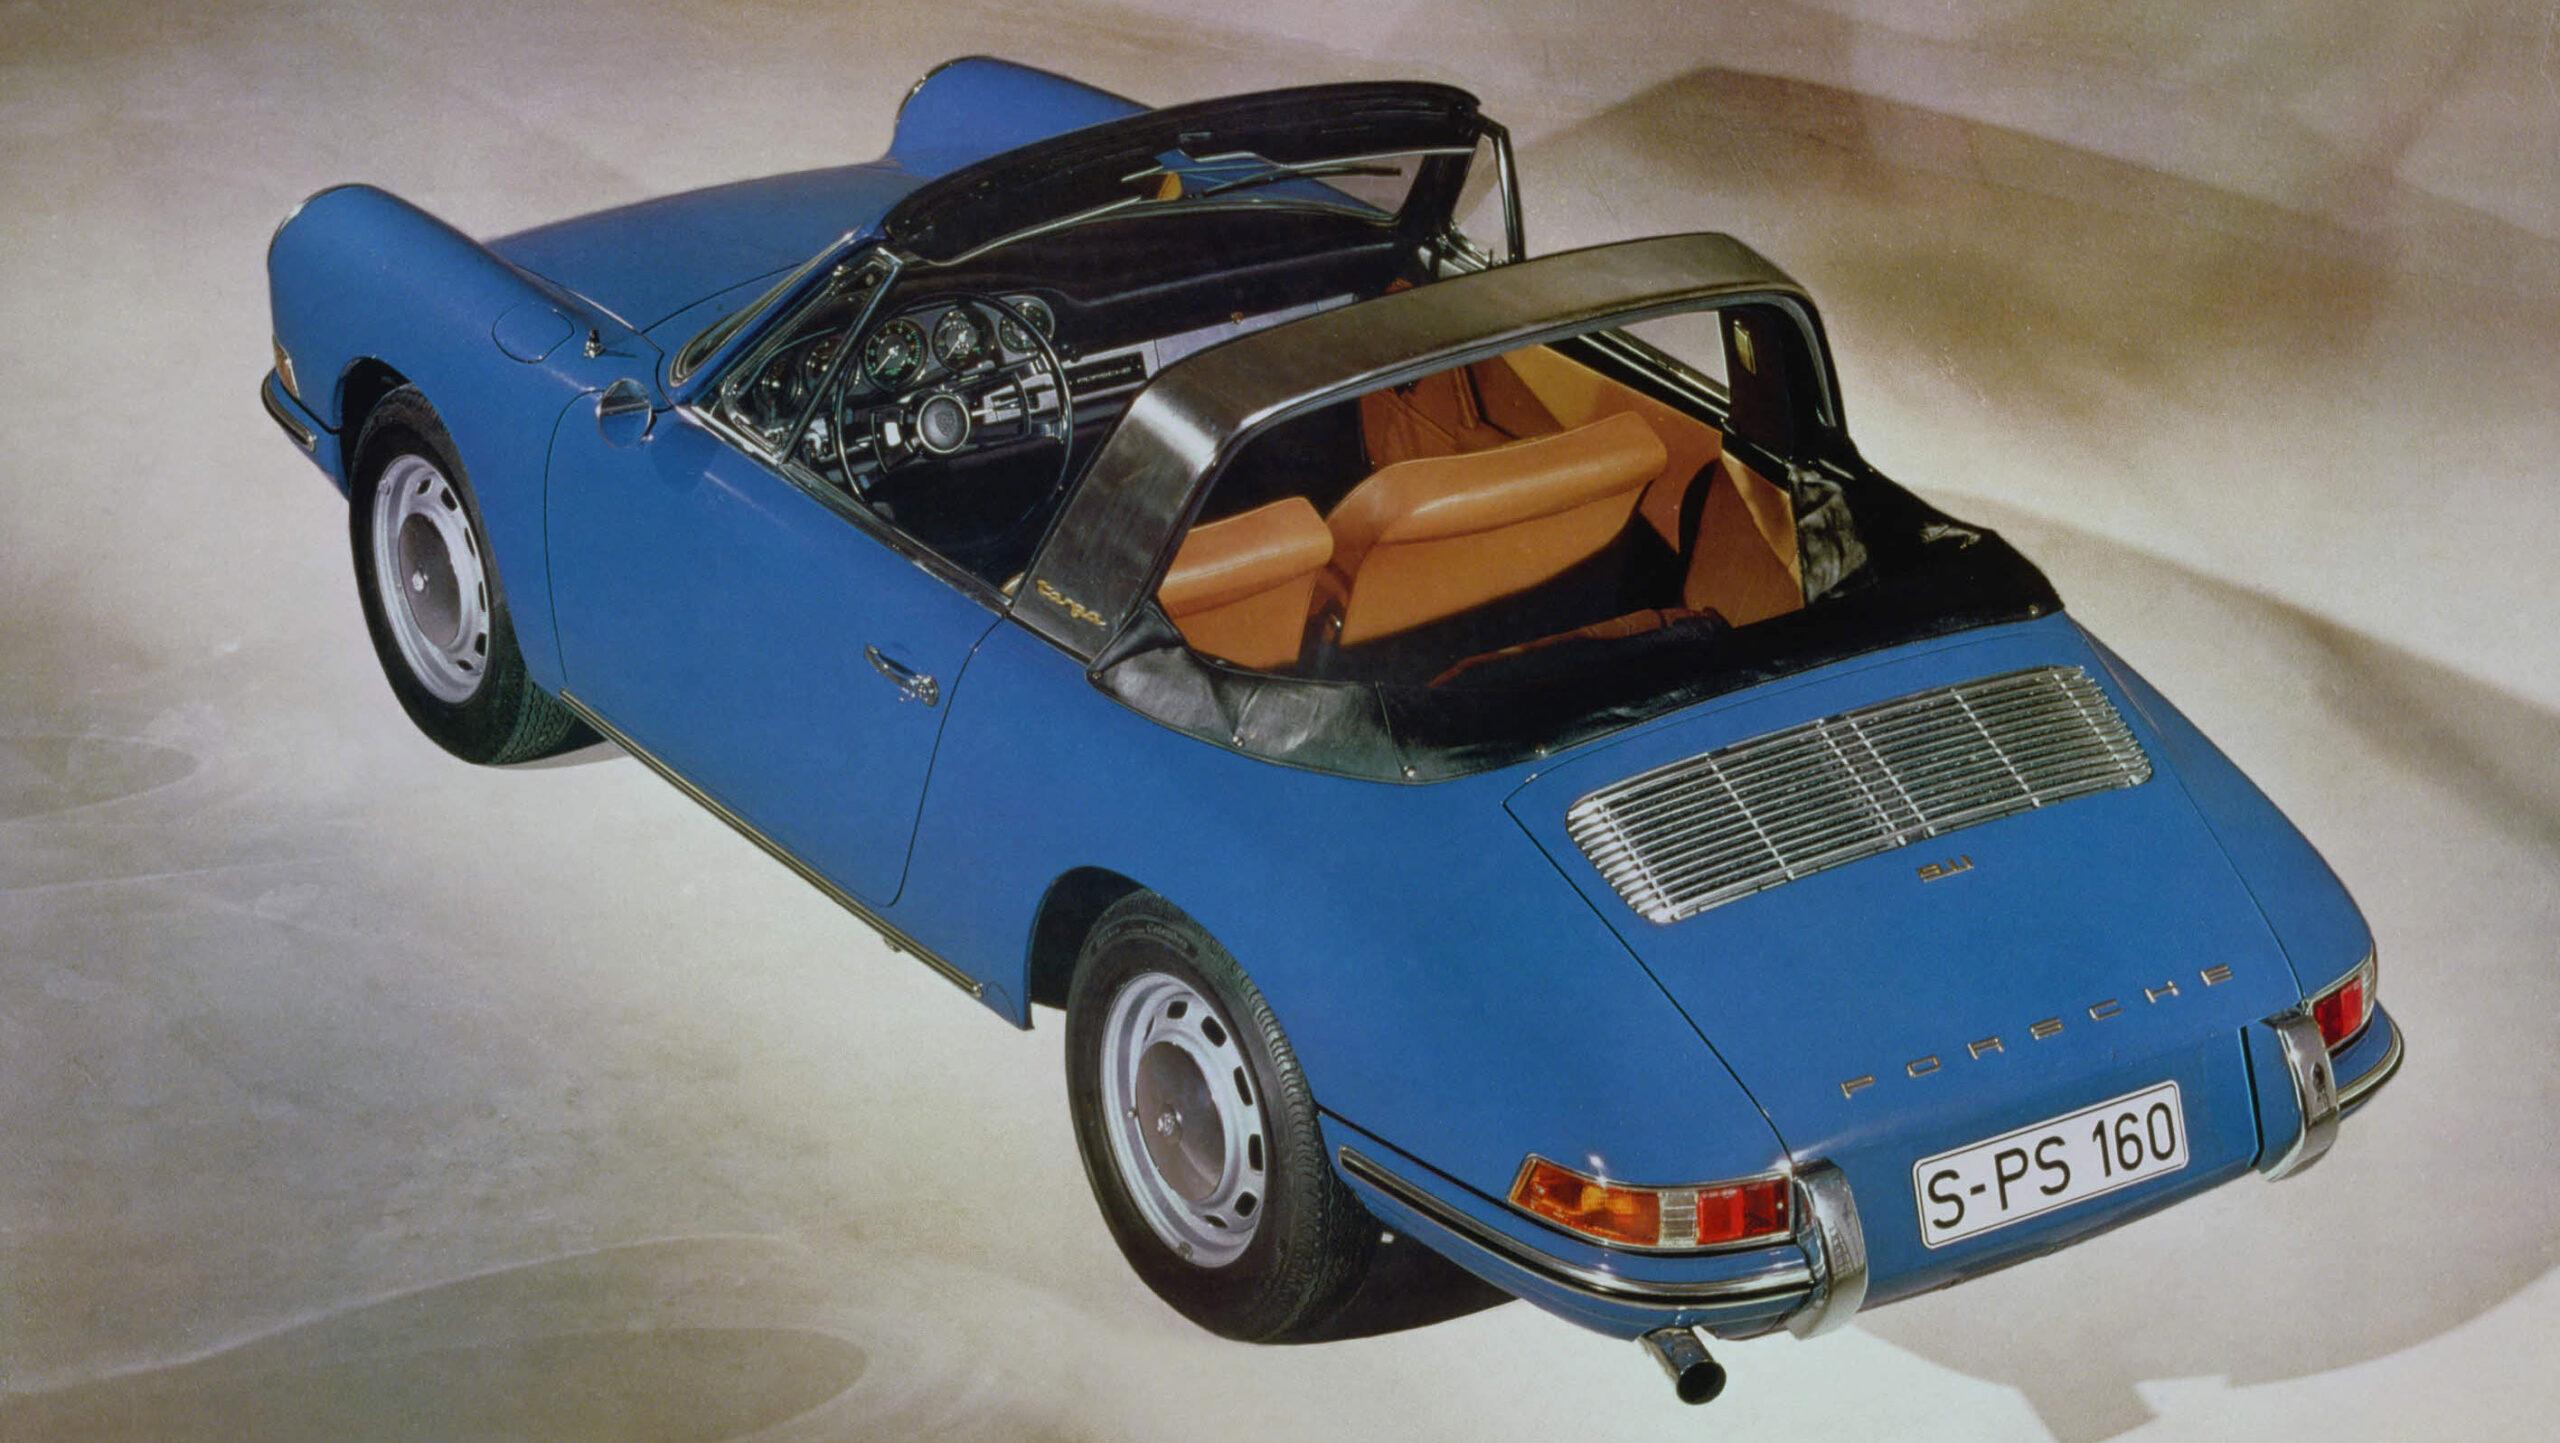 The Original 911 The Zuffenhausen Masterpiece